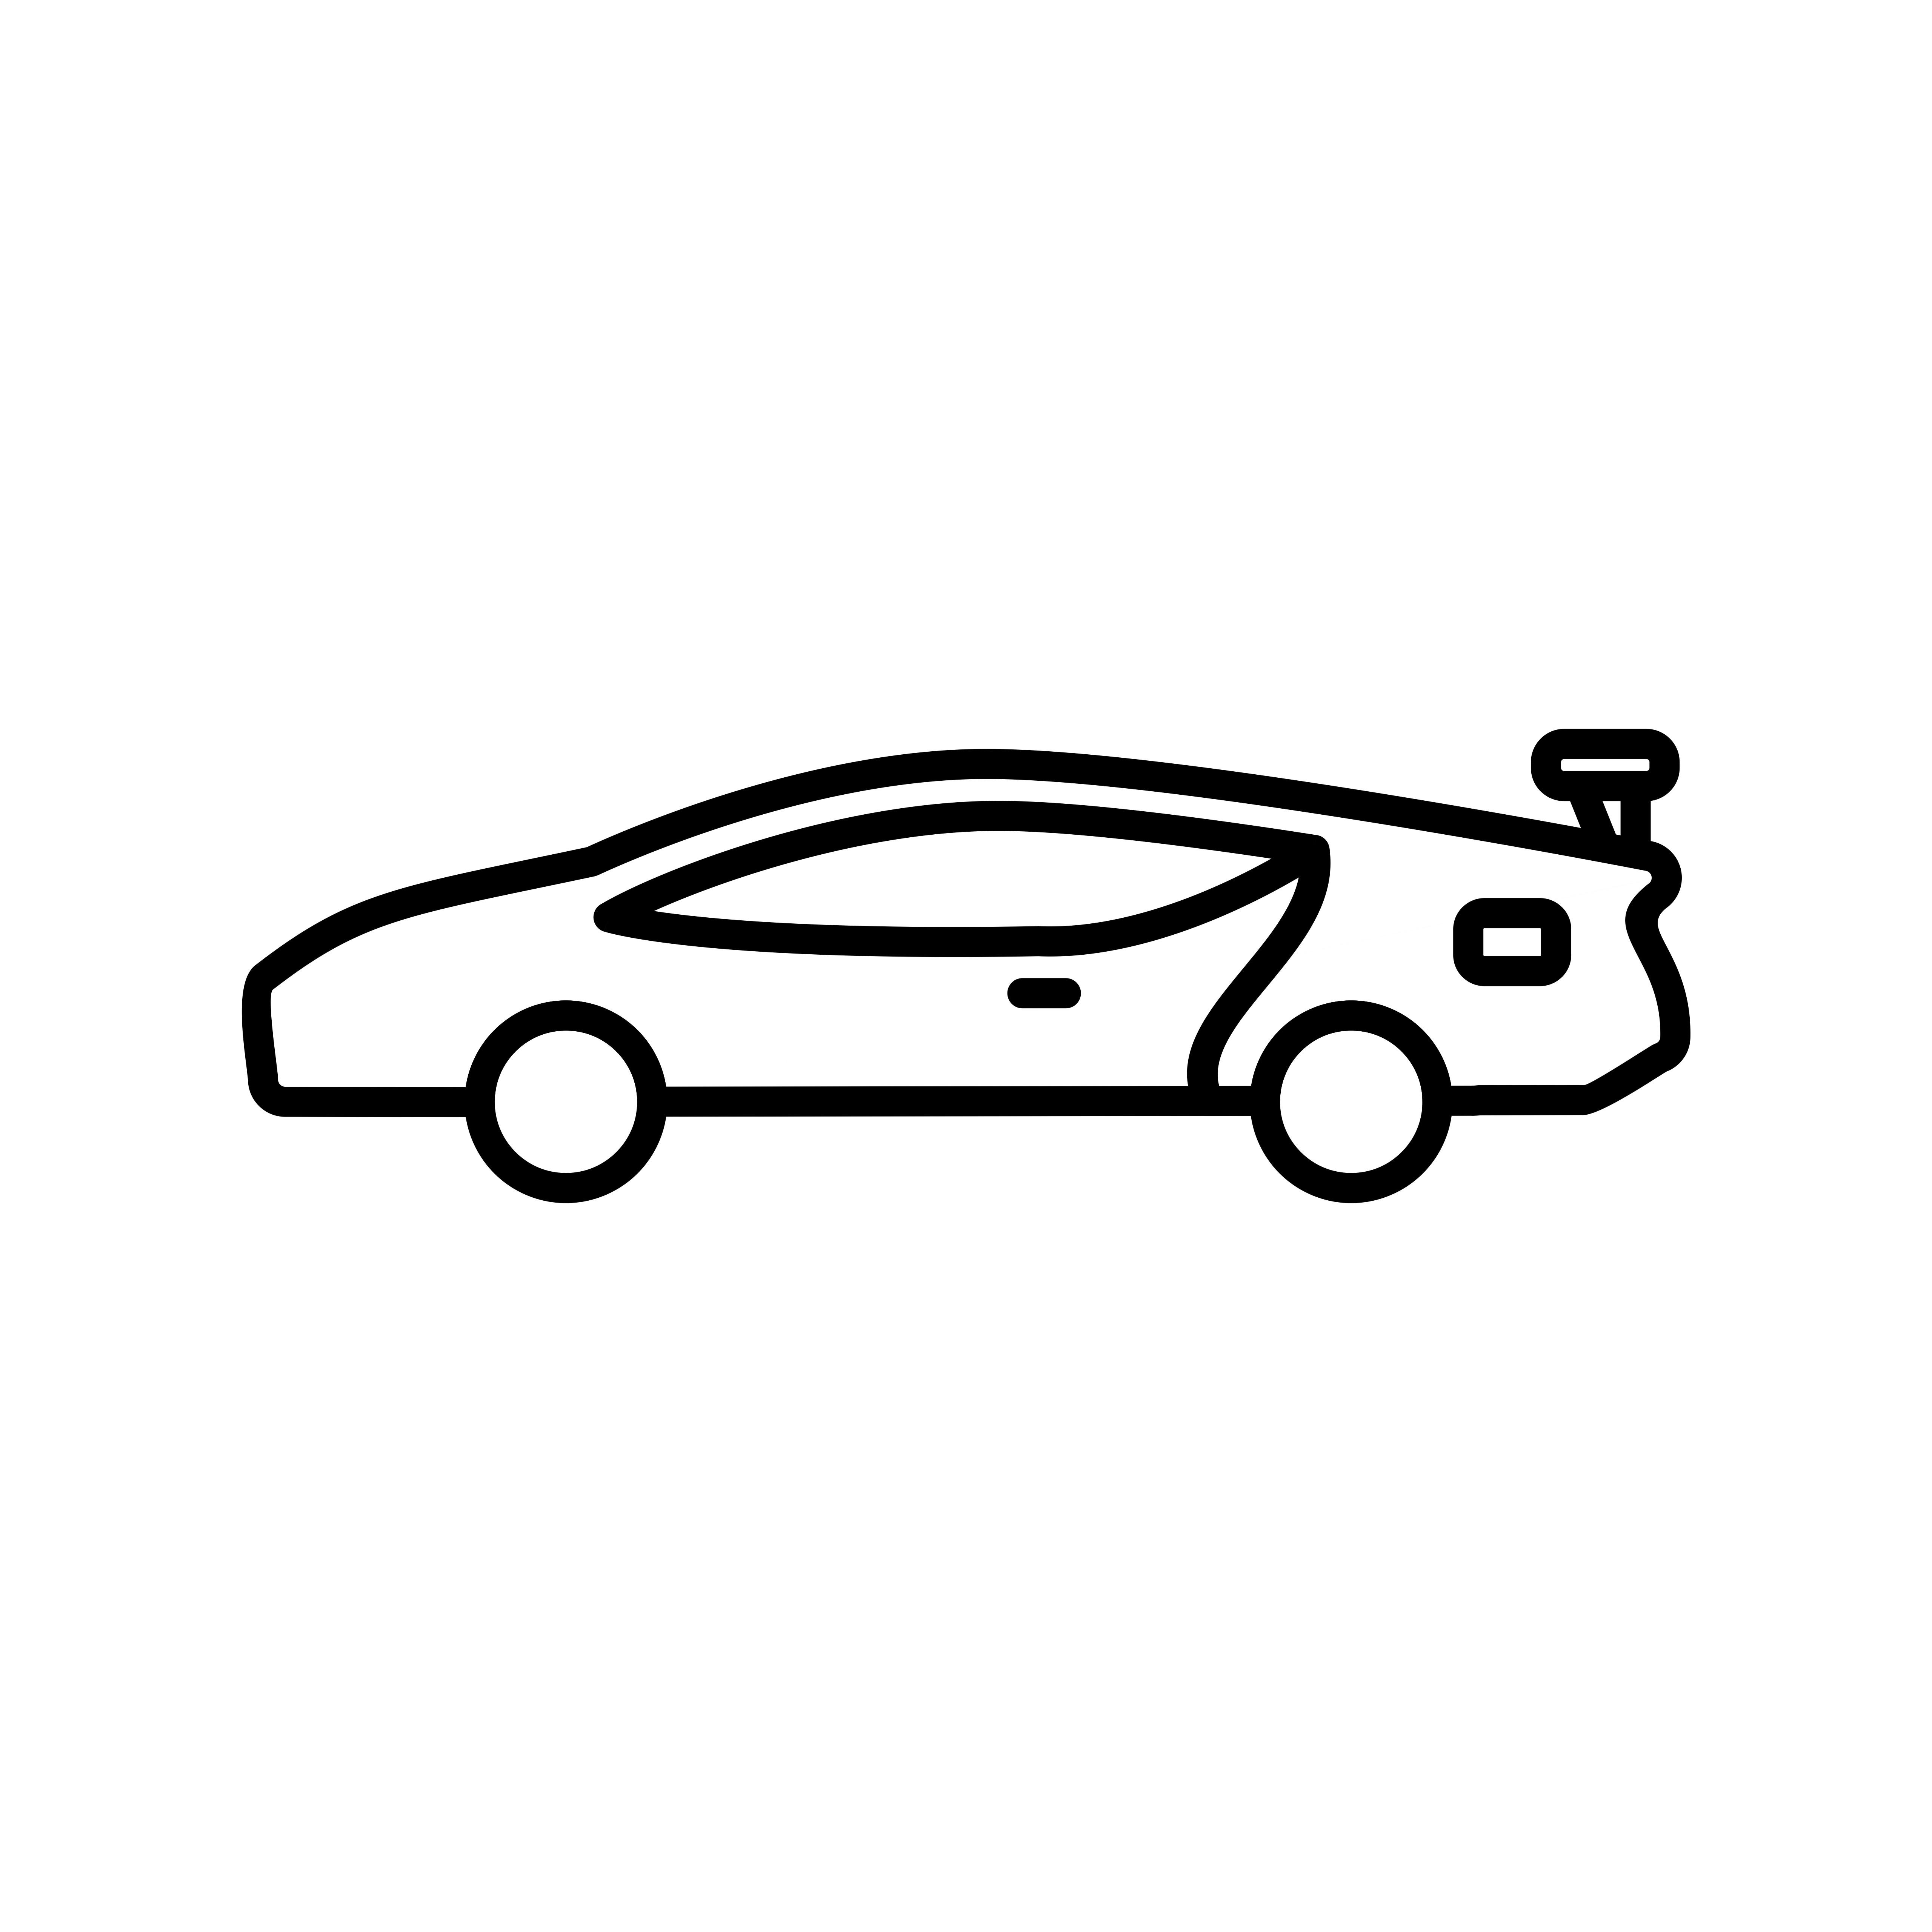 5120x5120 Sports Car Line Black Icon